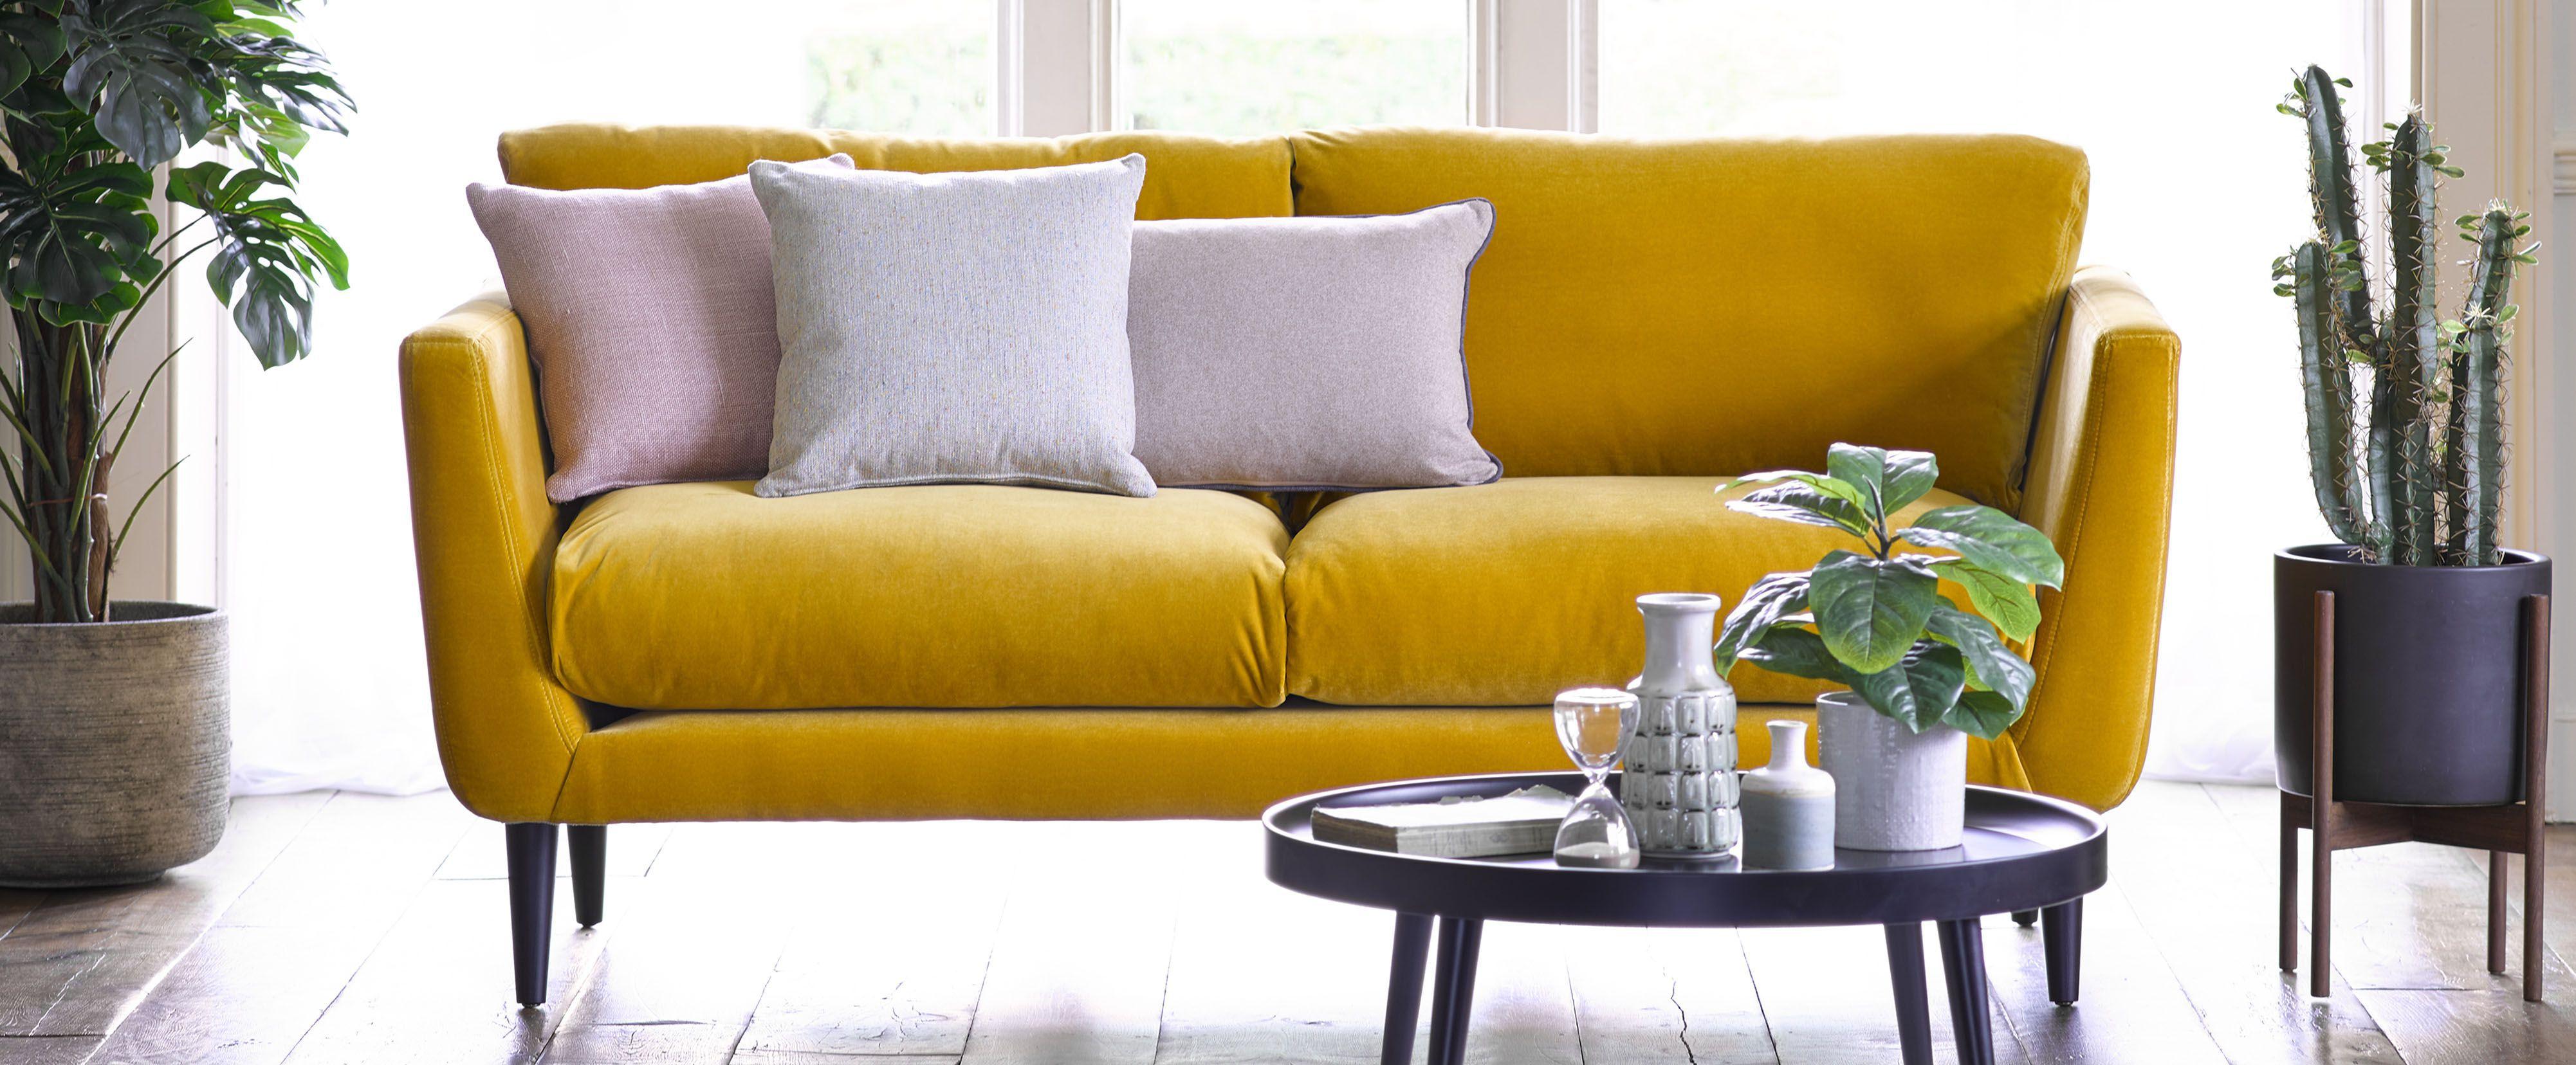 midcentury sofas.jpg